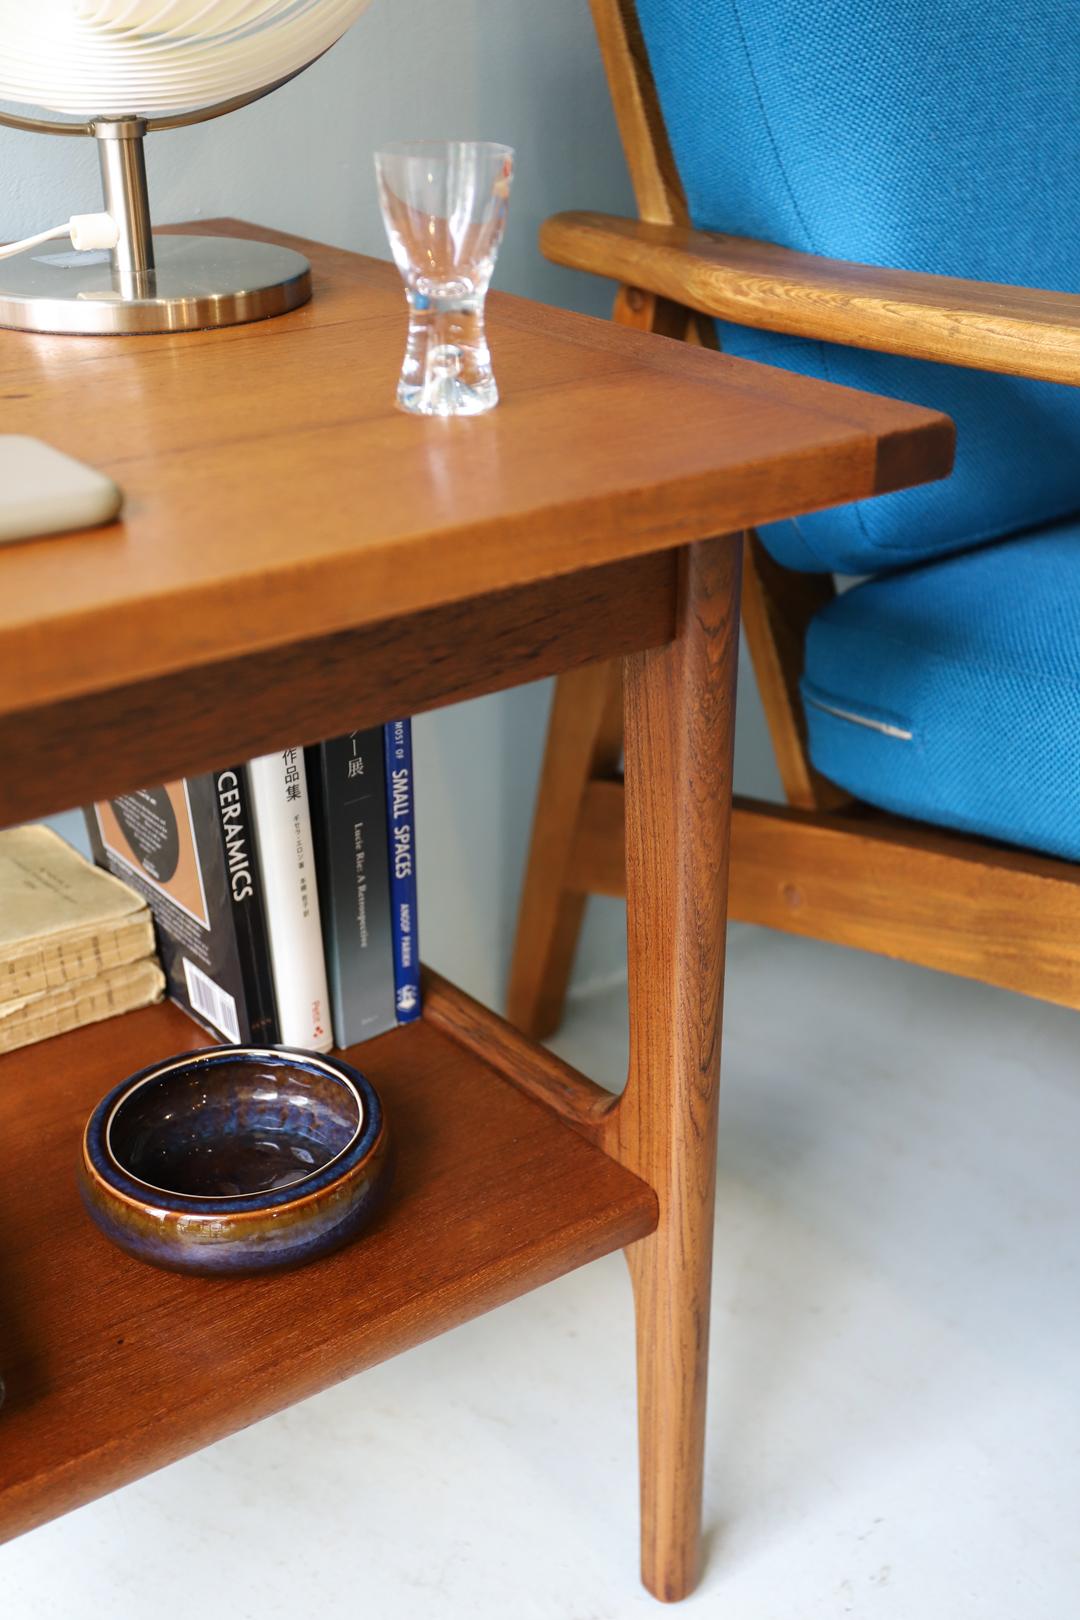 Danish Vintage Square Side Table Teakwood/デンマーク ヴィンテージ サイドテーブル チーク材 北欧家具 ミッドセンチュリー